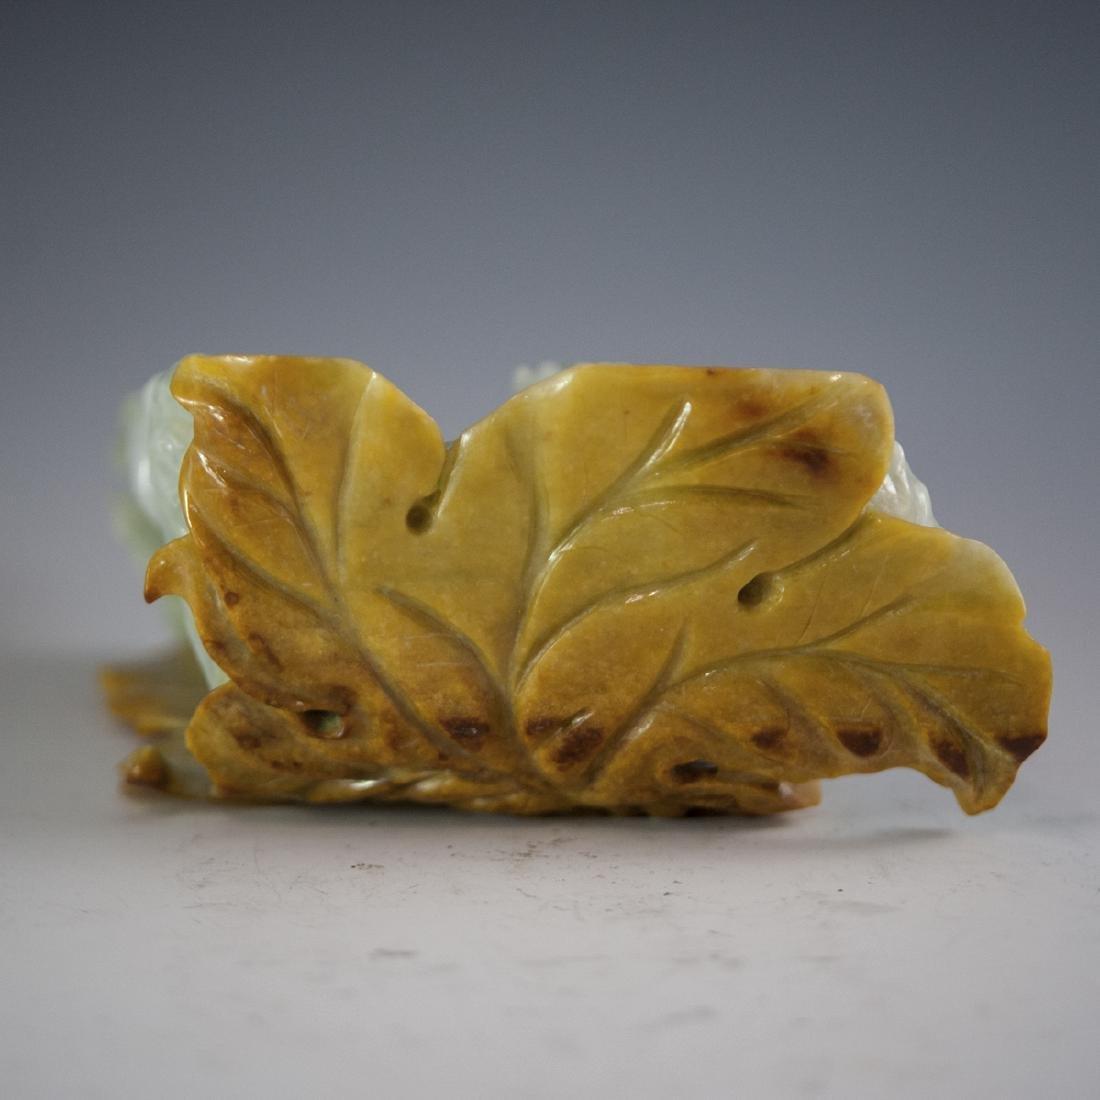 Chinese Carved Figural Jade Wiseman - 5